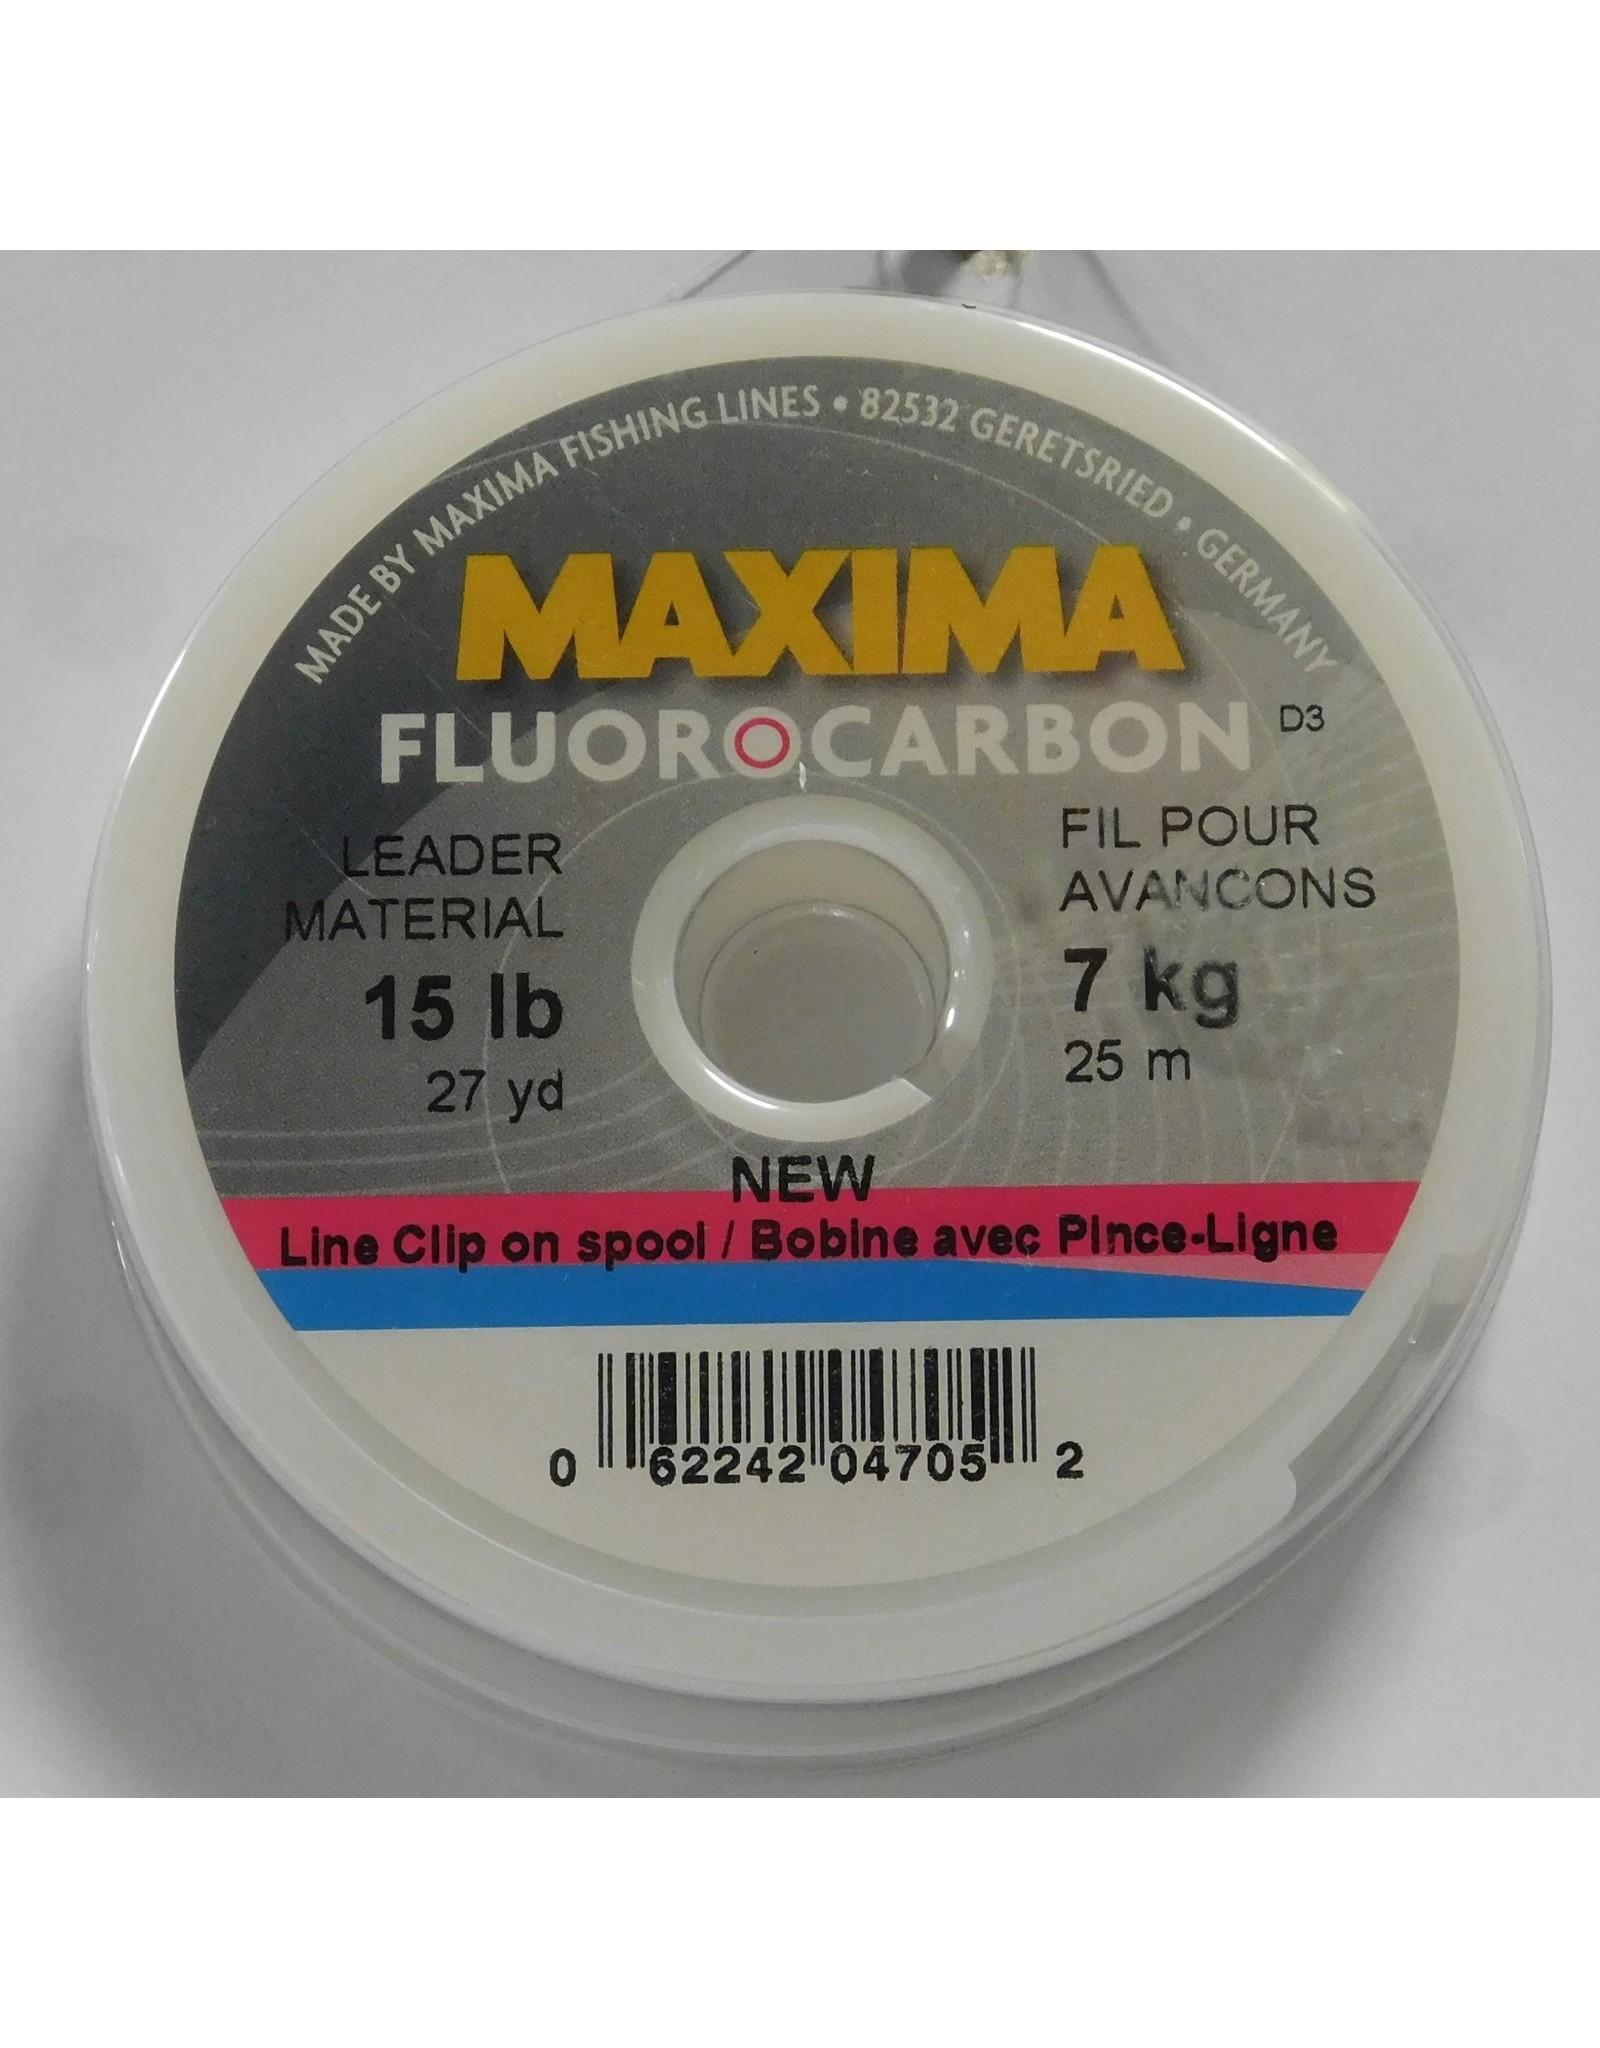 Maxima Maxima Fluorocarbon Leader Wheel 15lb